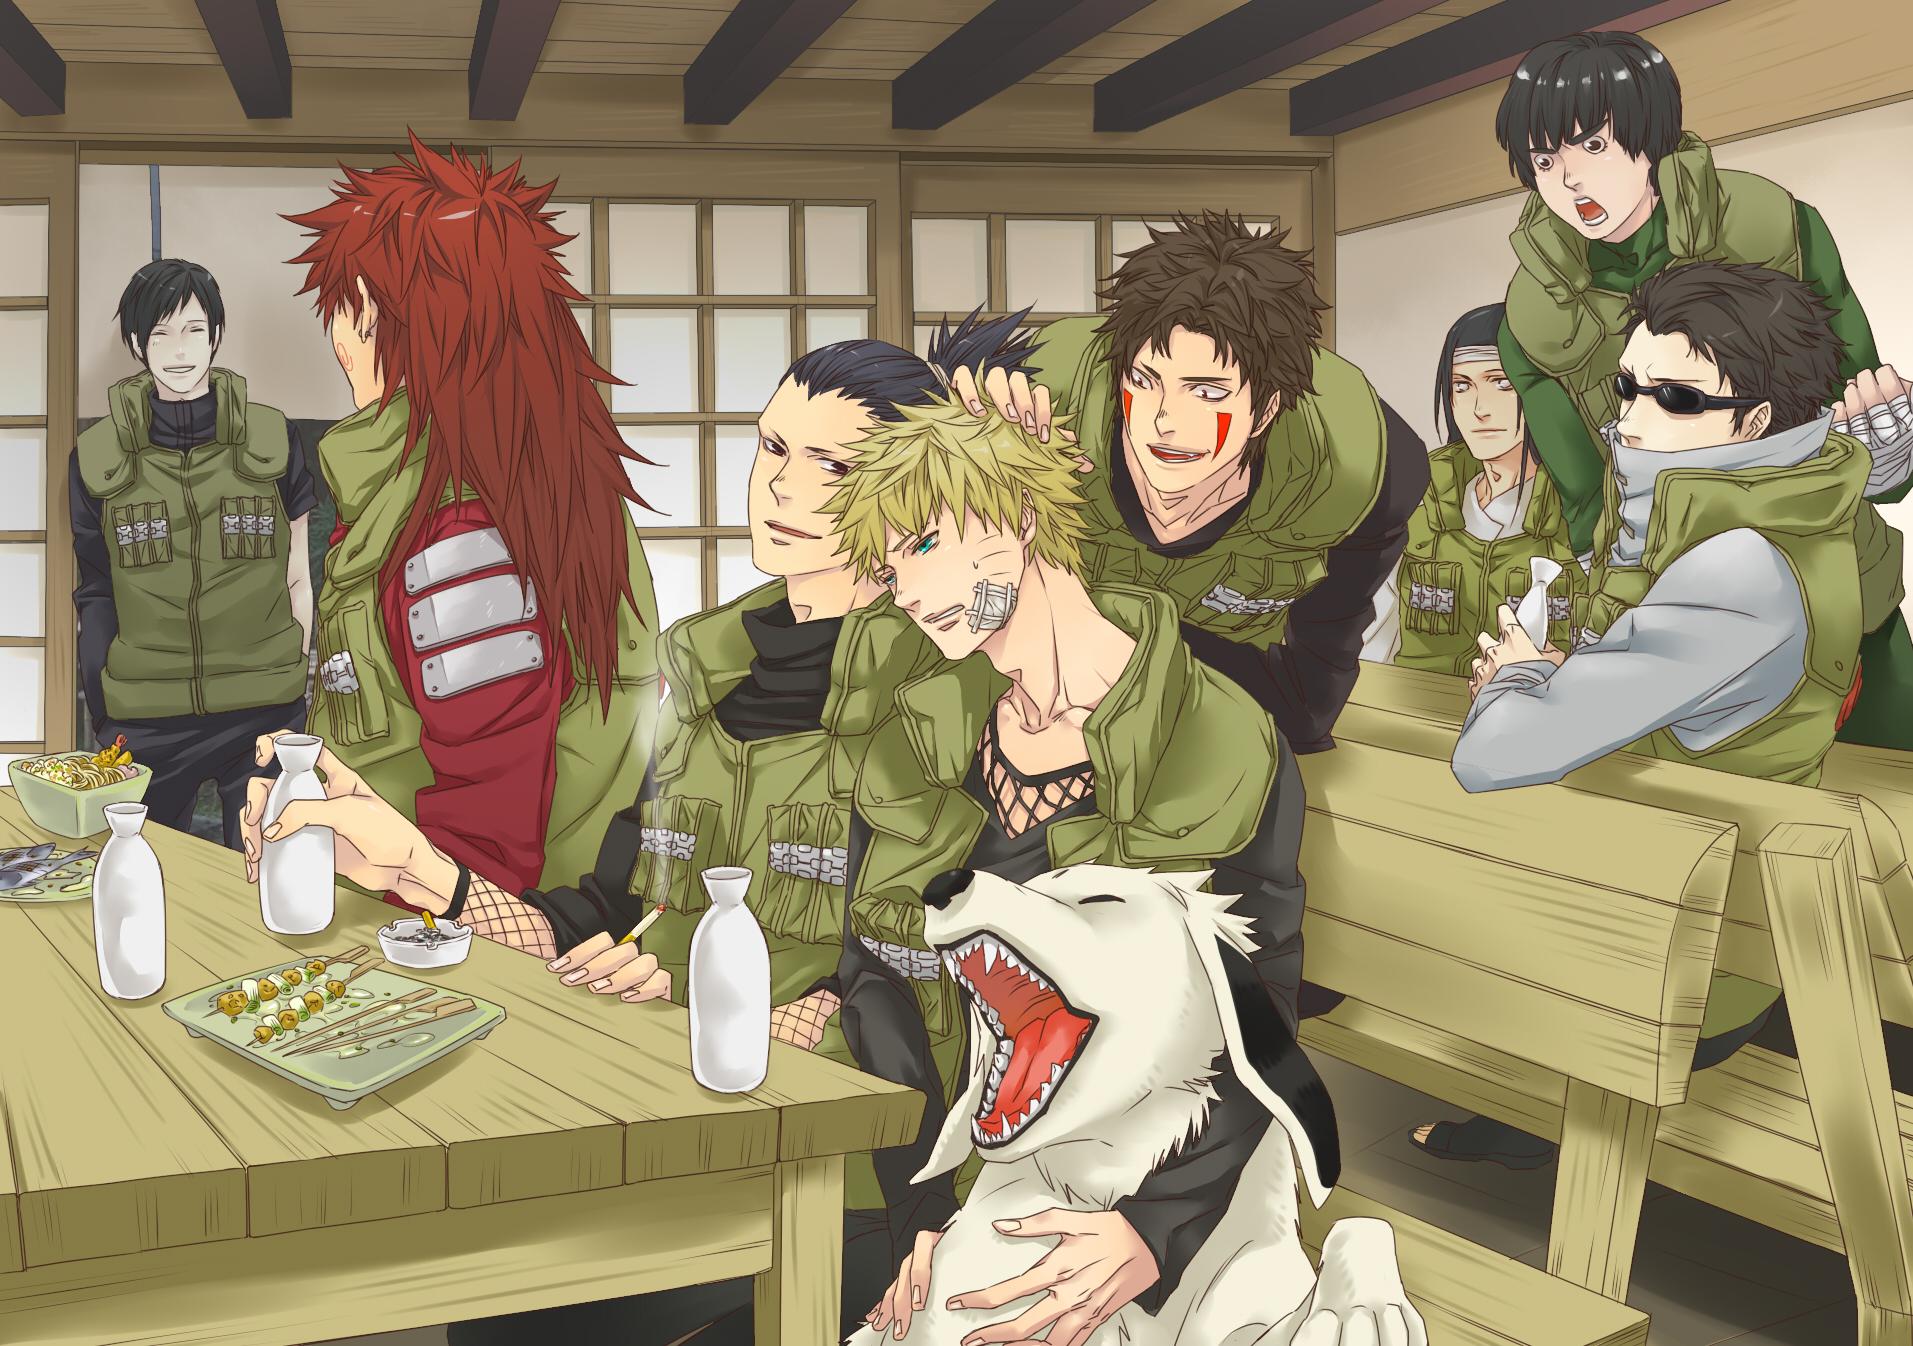 Hyuuga neji fanart zerochan anime image board - Image de naruto ...